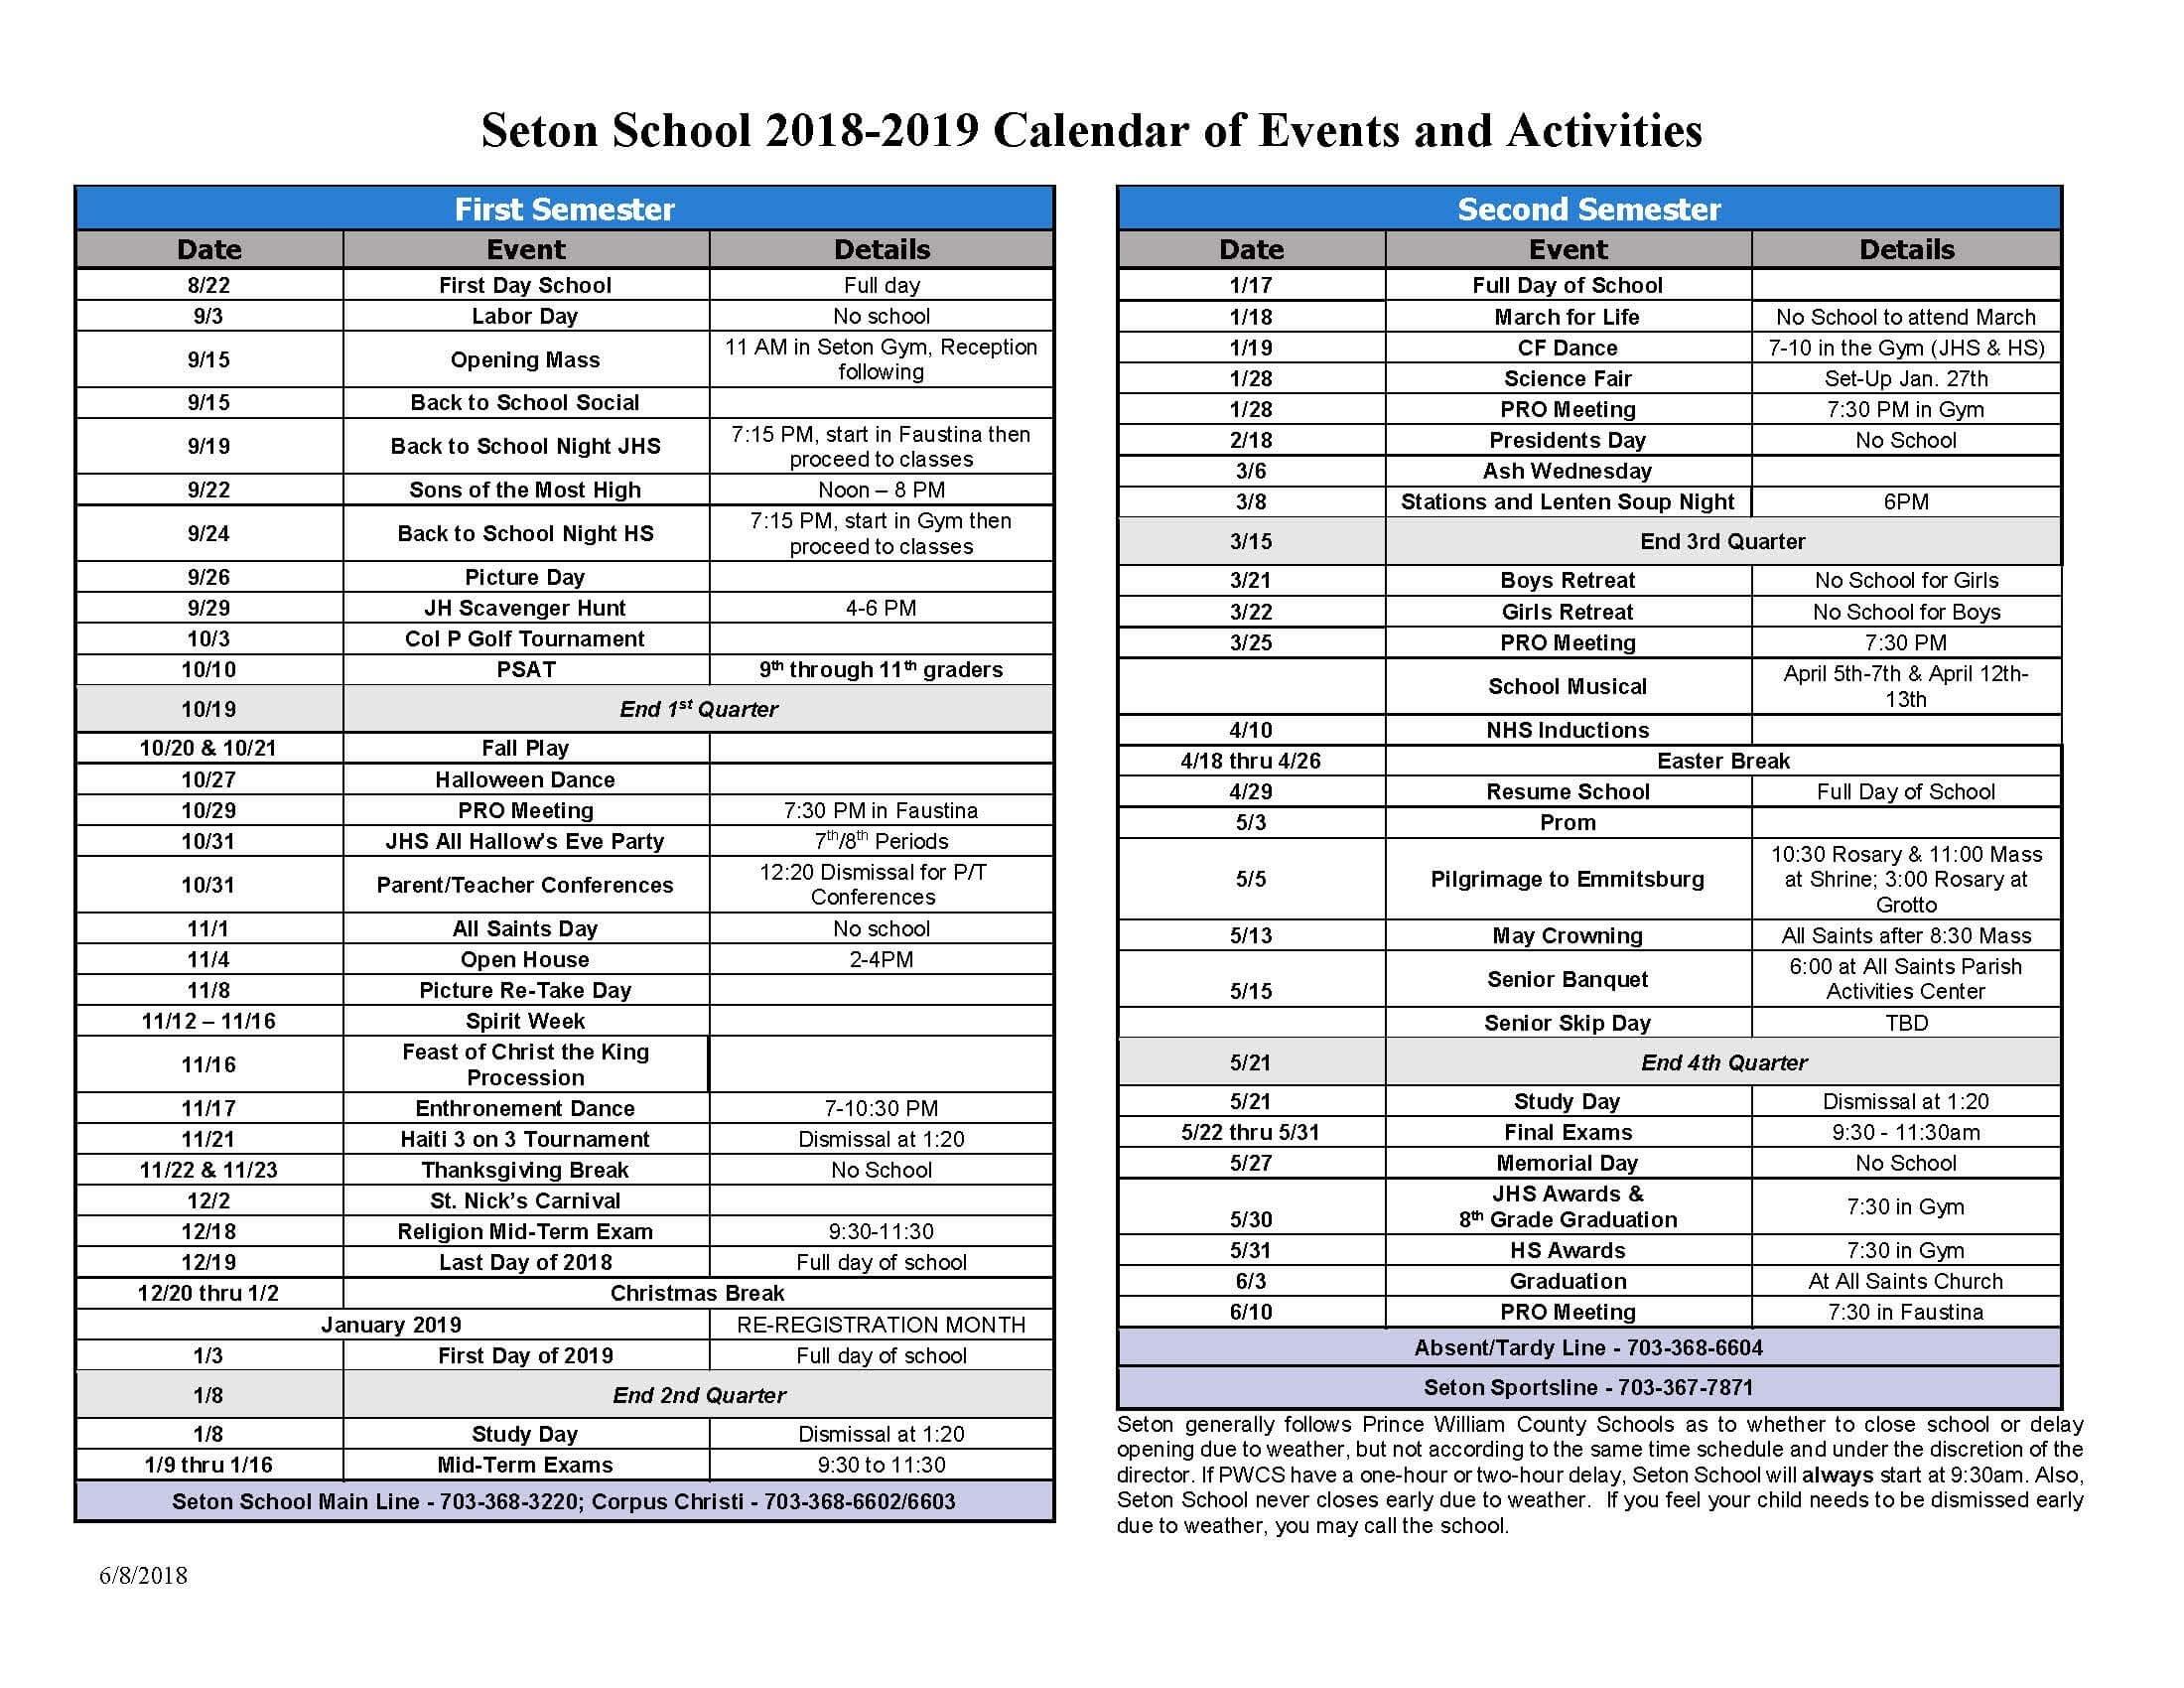 Events Calendar | Seton School Manassas within Calender Of Term 1 Events